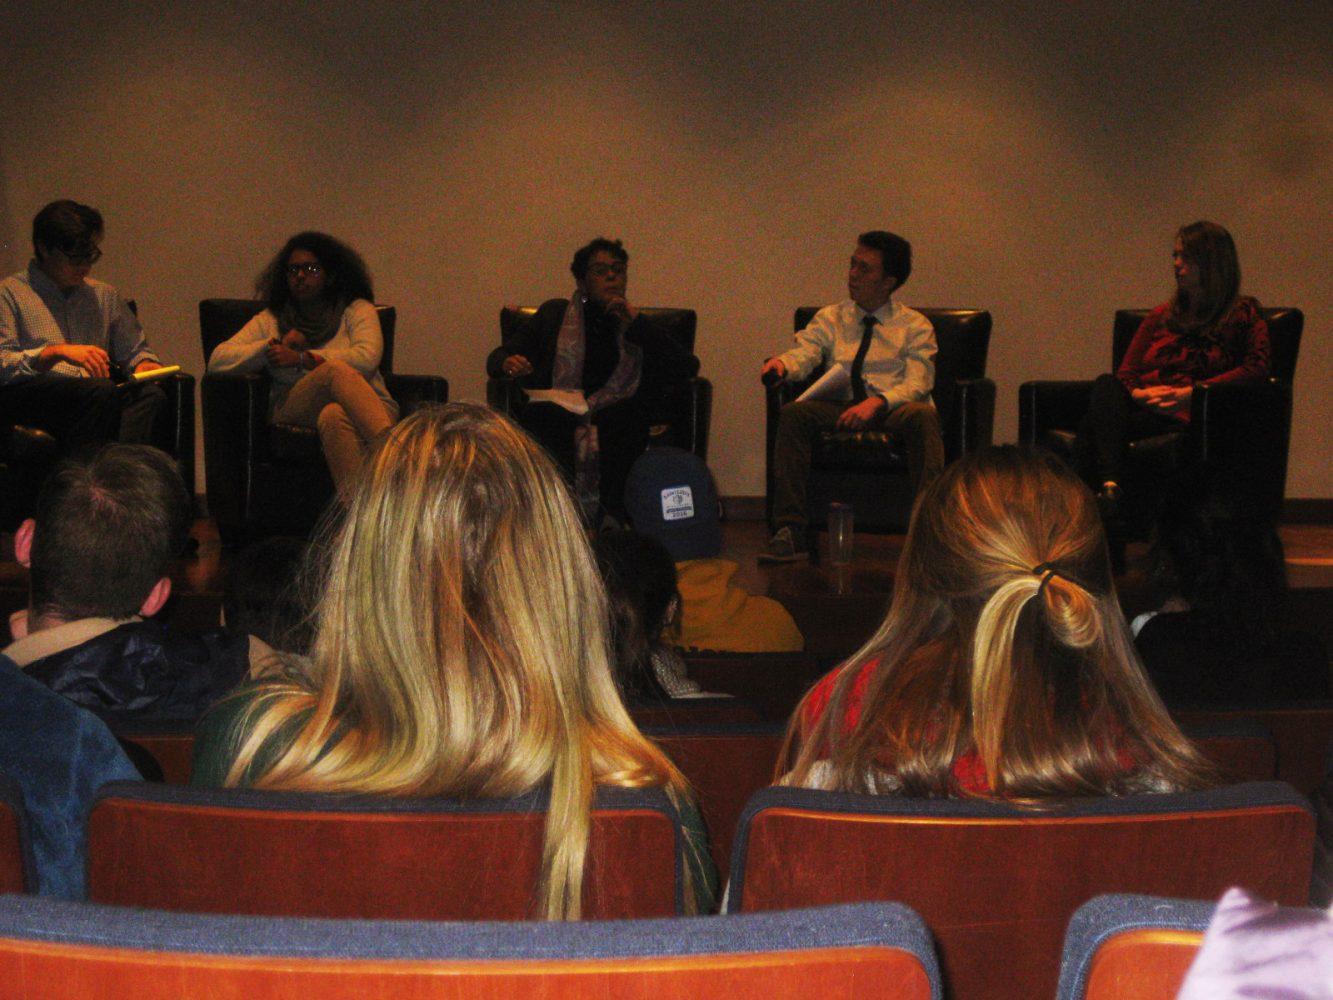 Panel+talks+identity+in+the+classroom